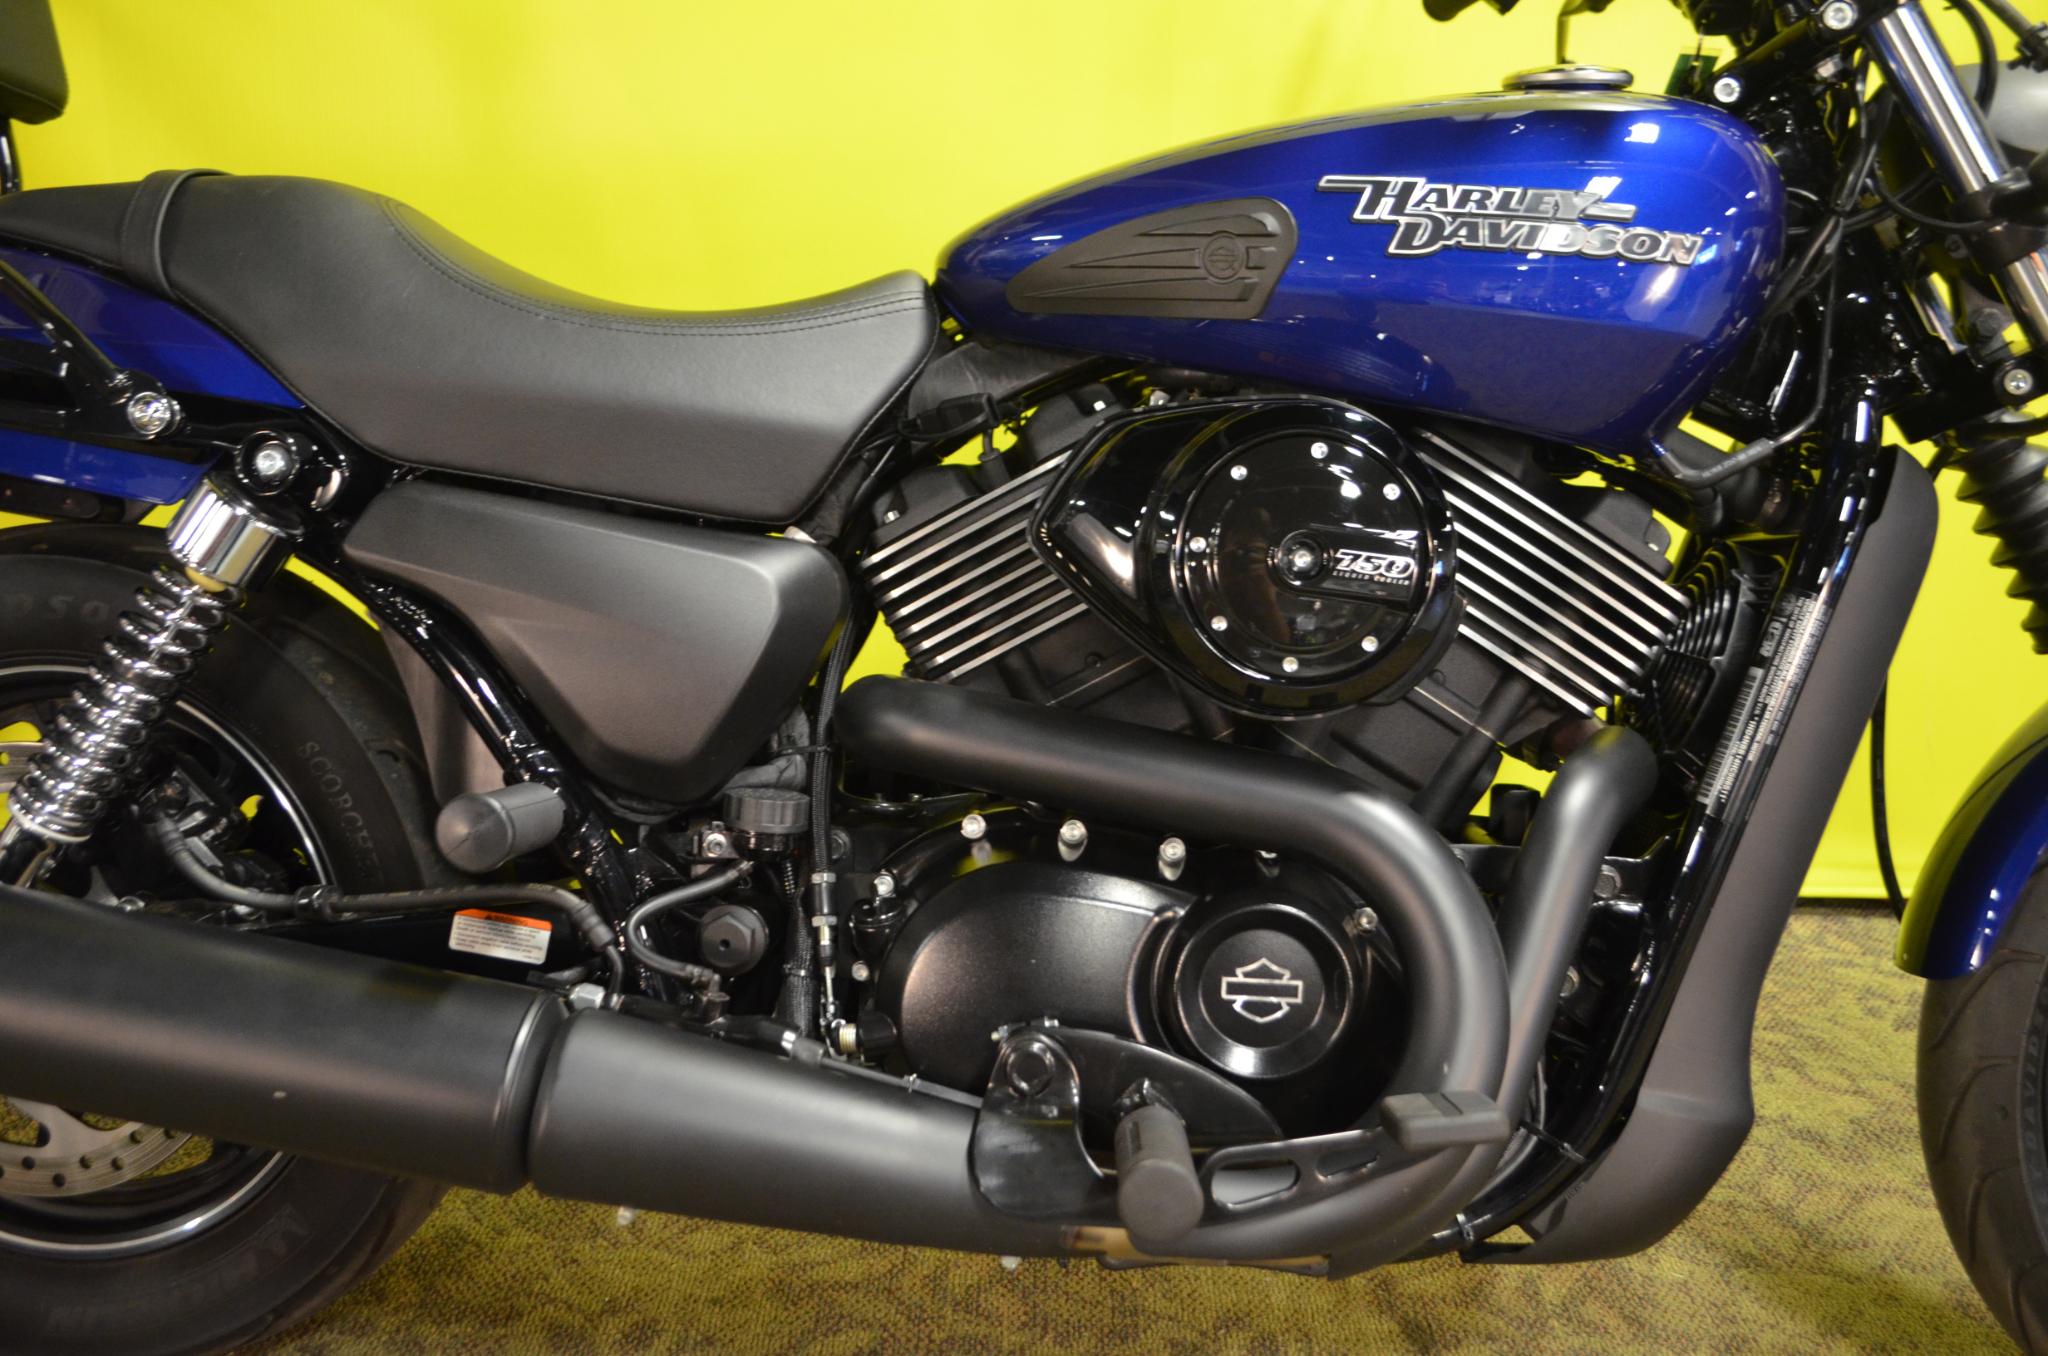 2017 Harley-Davidson Street 750 XG750